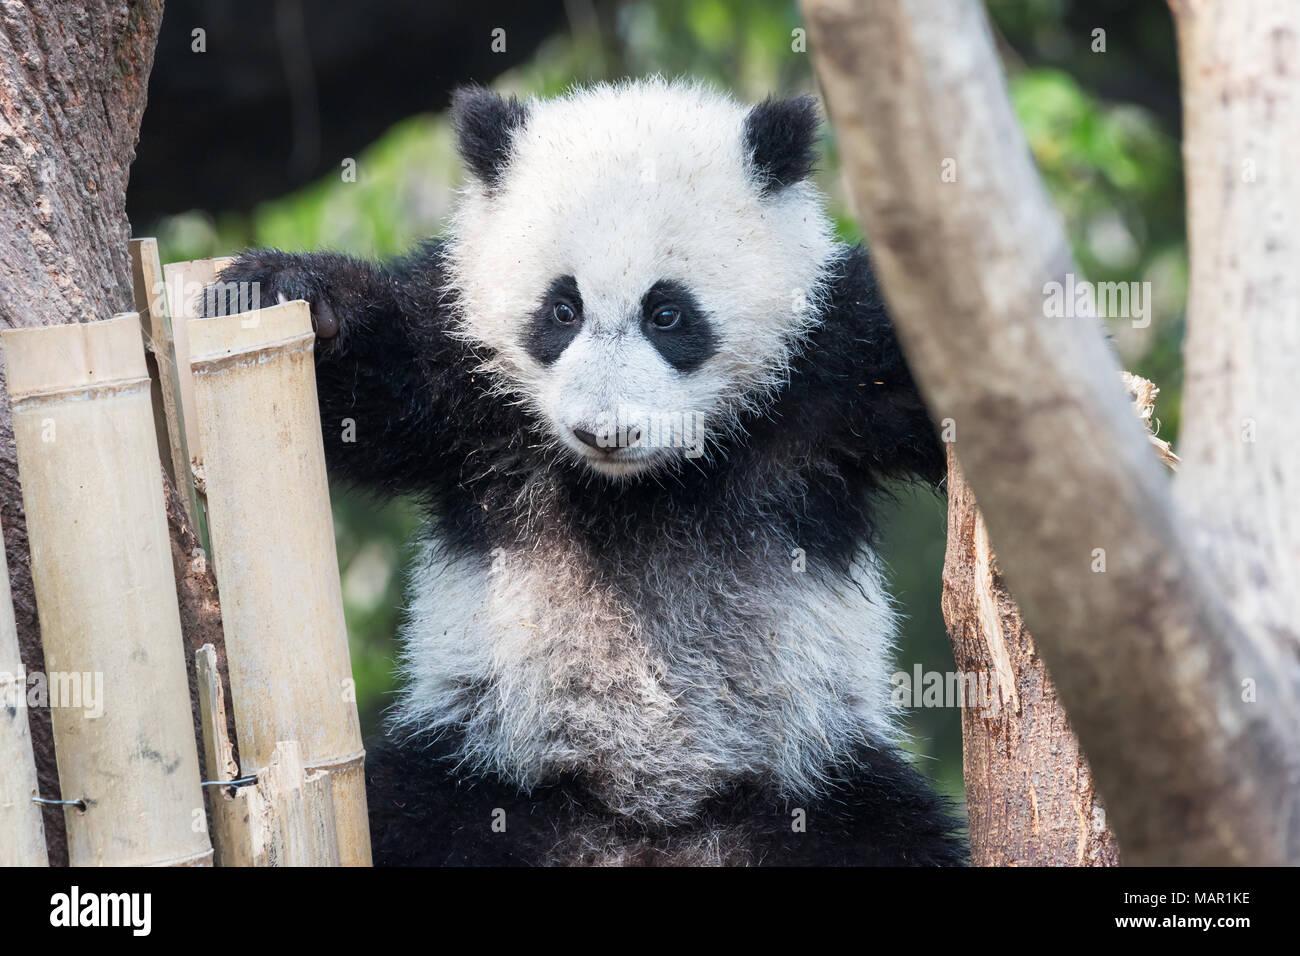 Panda cub playing in a tree, Chengdu, China Stock Photo